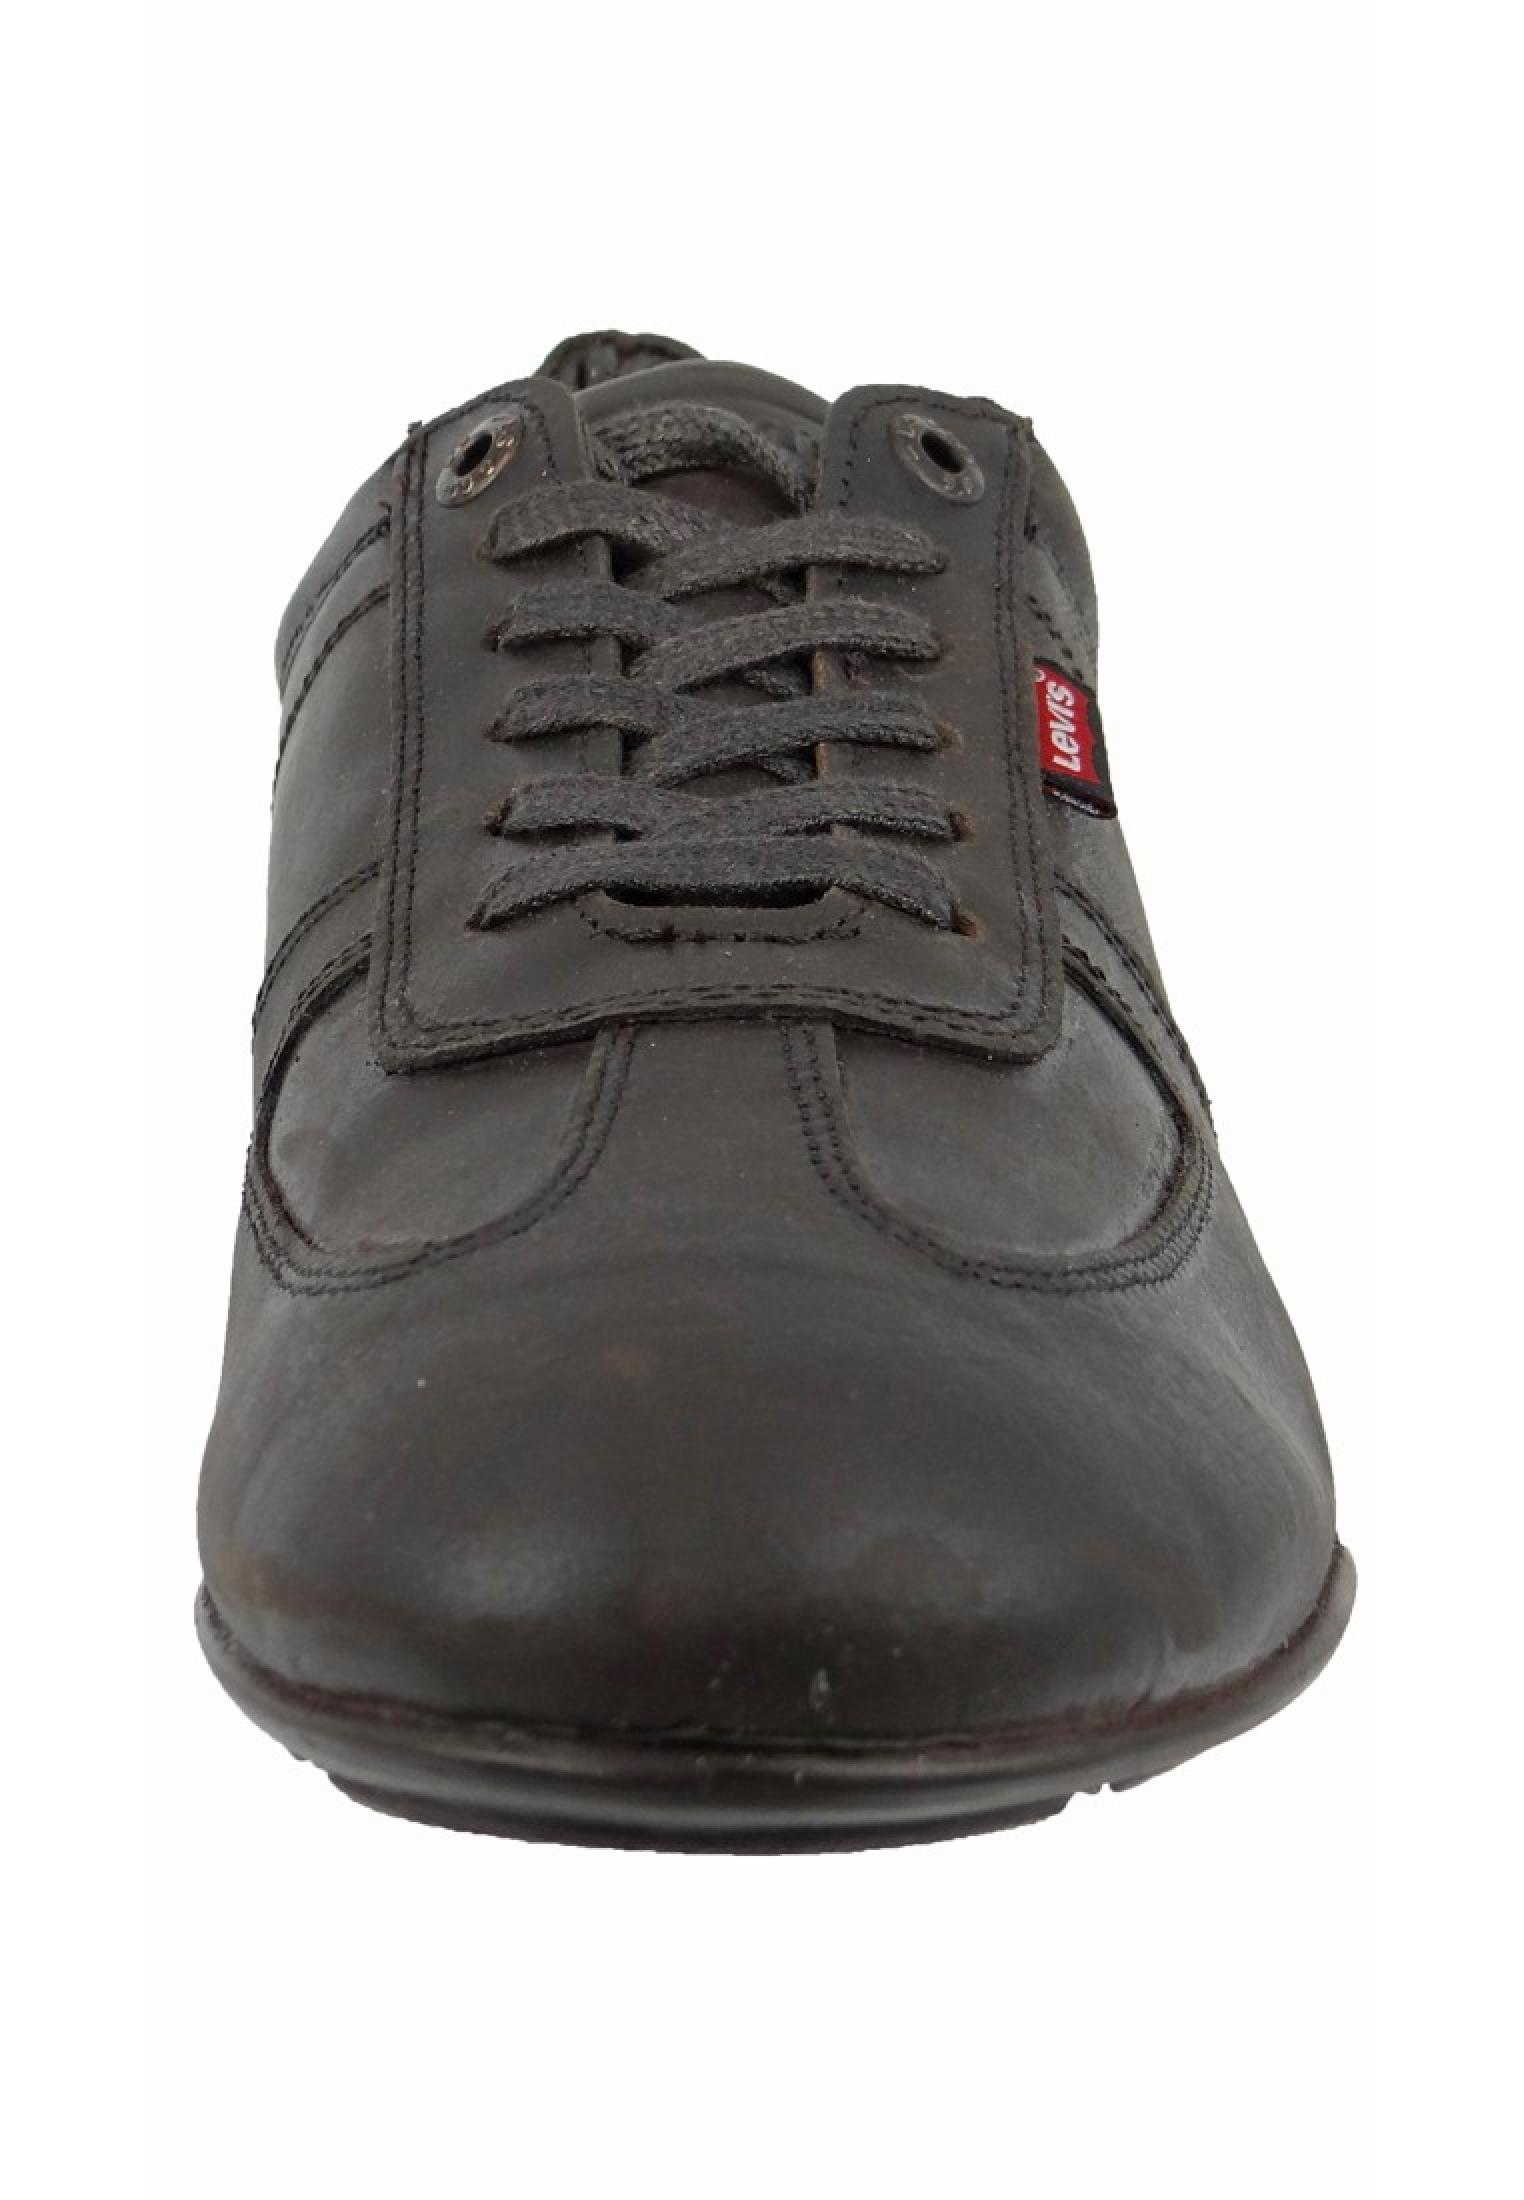 levis schuhe sneaker chula vista dark brown dunkelbraun. Black Bedroom Furniture Sets. Home Design Ideas